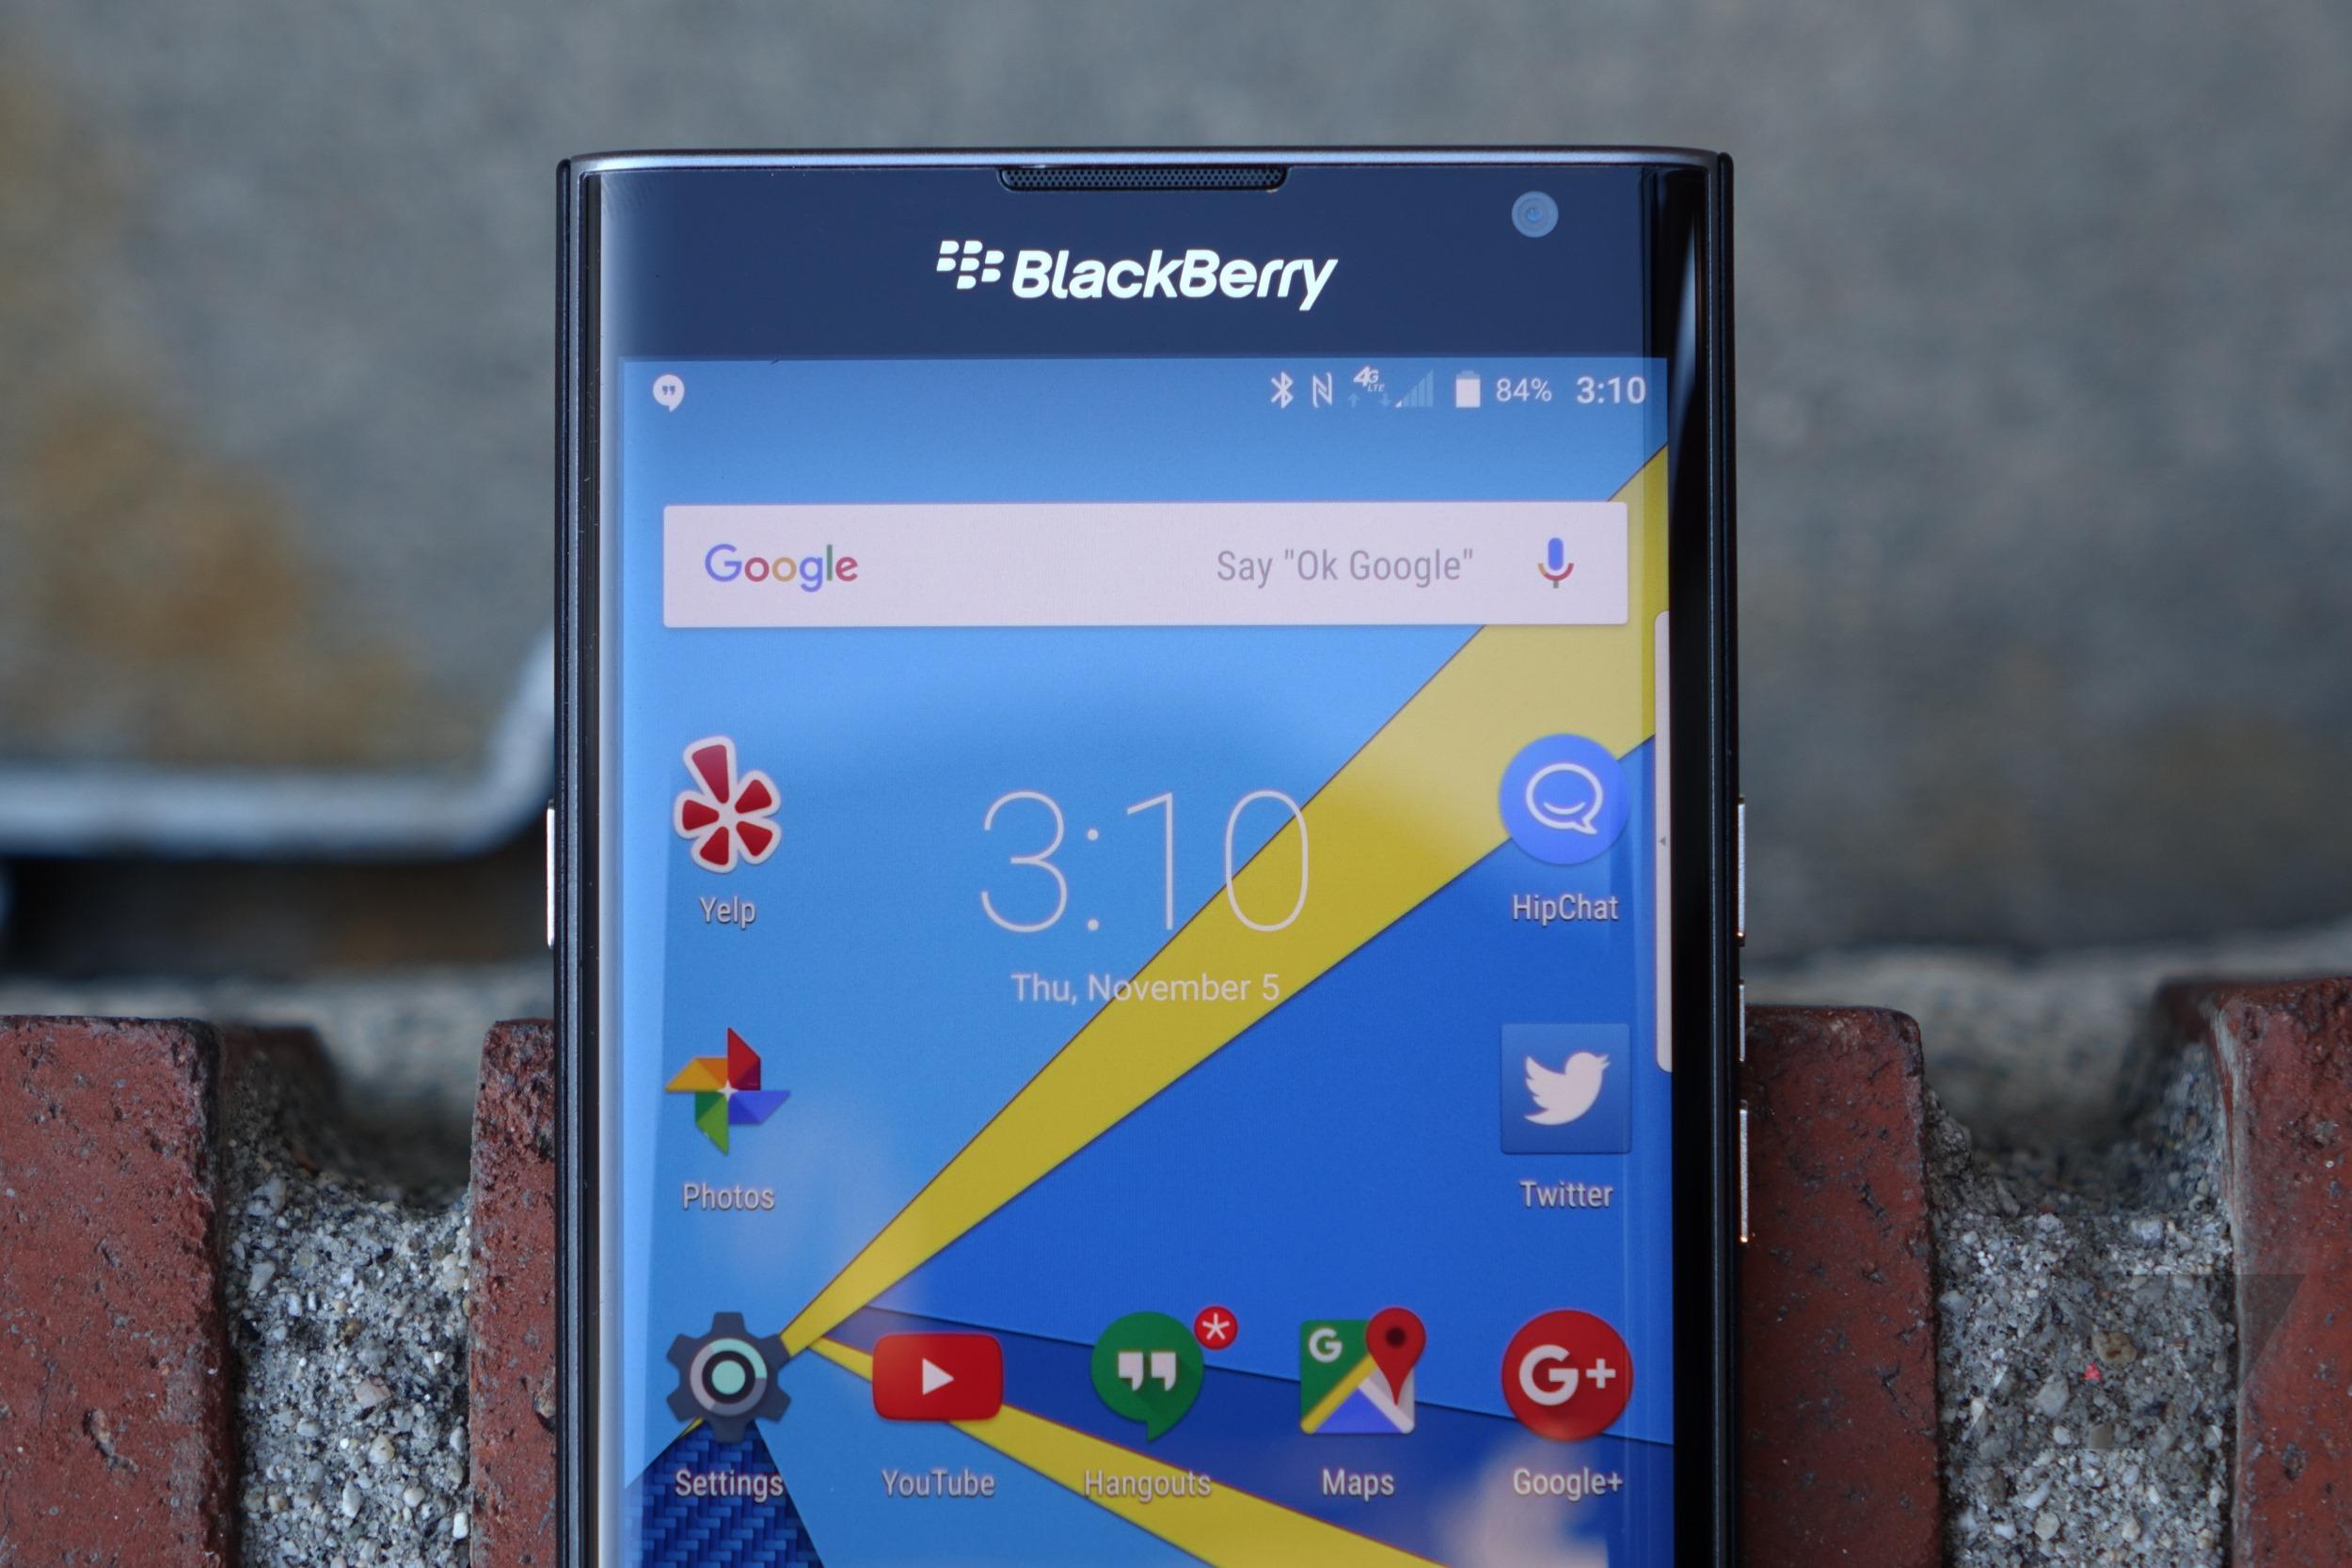 Deal Alert] You can order an unlocked BlackBerry Priv on eBay for